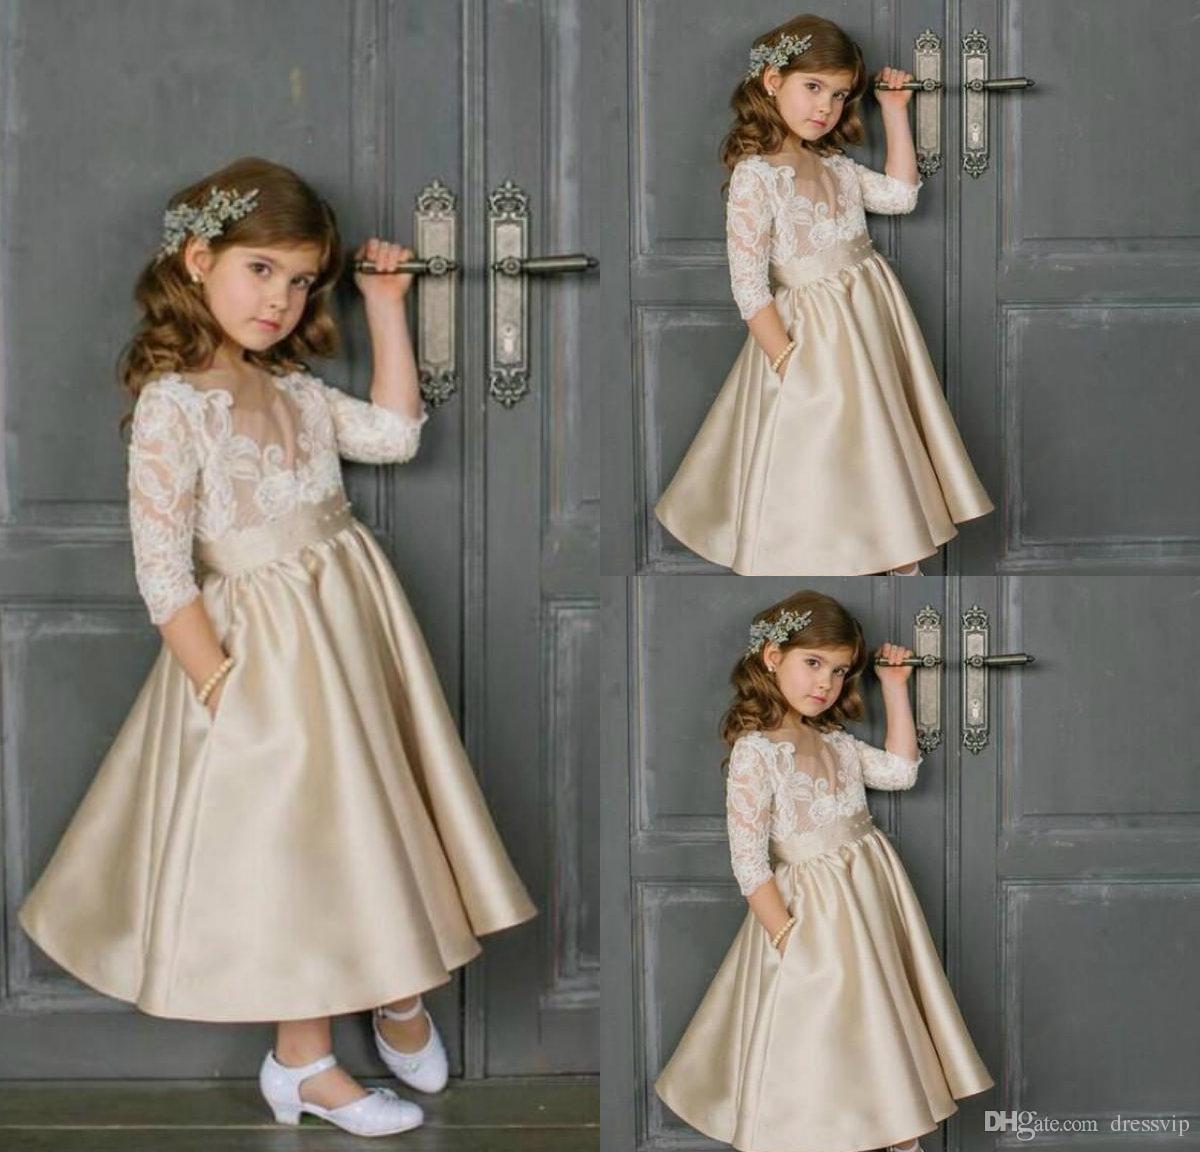 88f4ba27c 2018 Champagne Flower Girls Dresses Sheer Neck Vintage Lace Appliques  Illusion 3/4 Sleeves Satin Ankle Length Girls Formal Gown Flowergirl  Princess Dresses ...